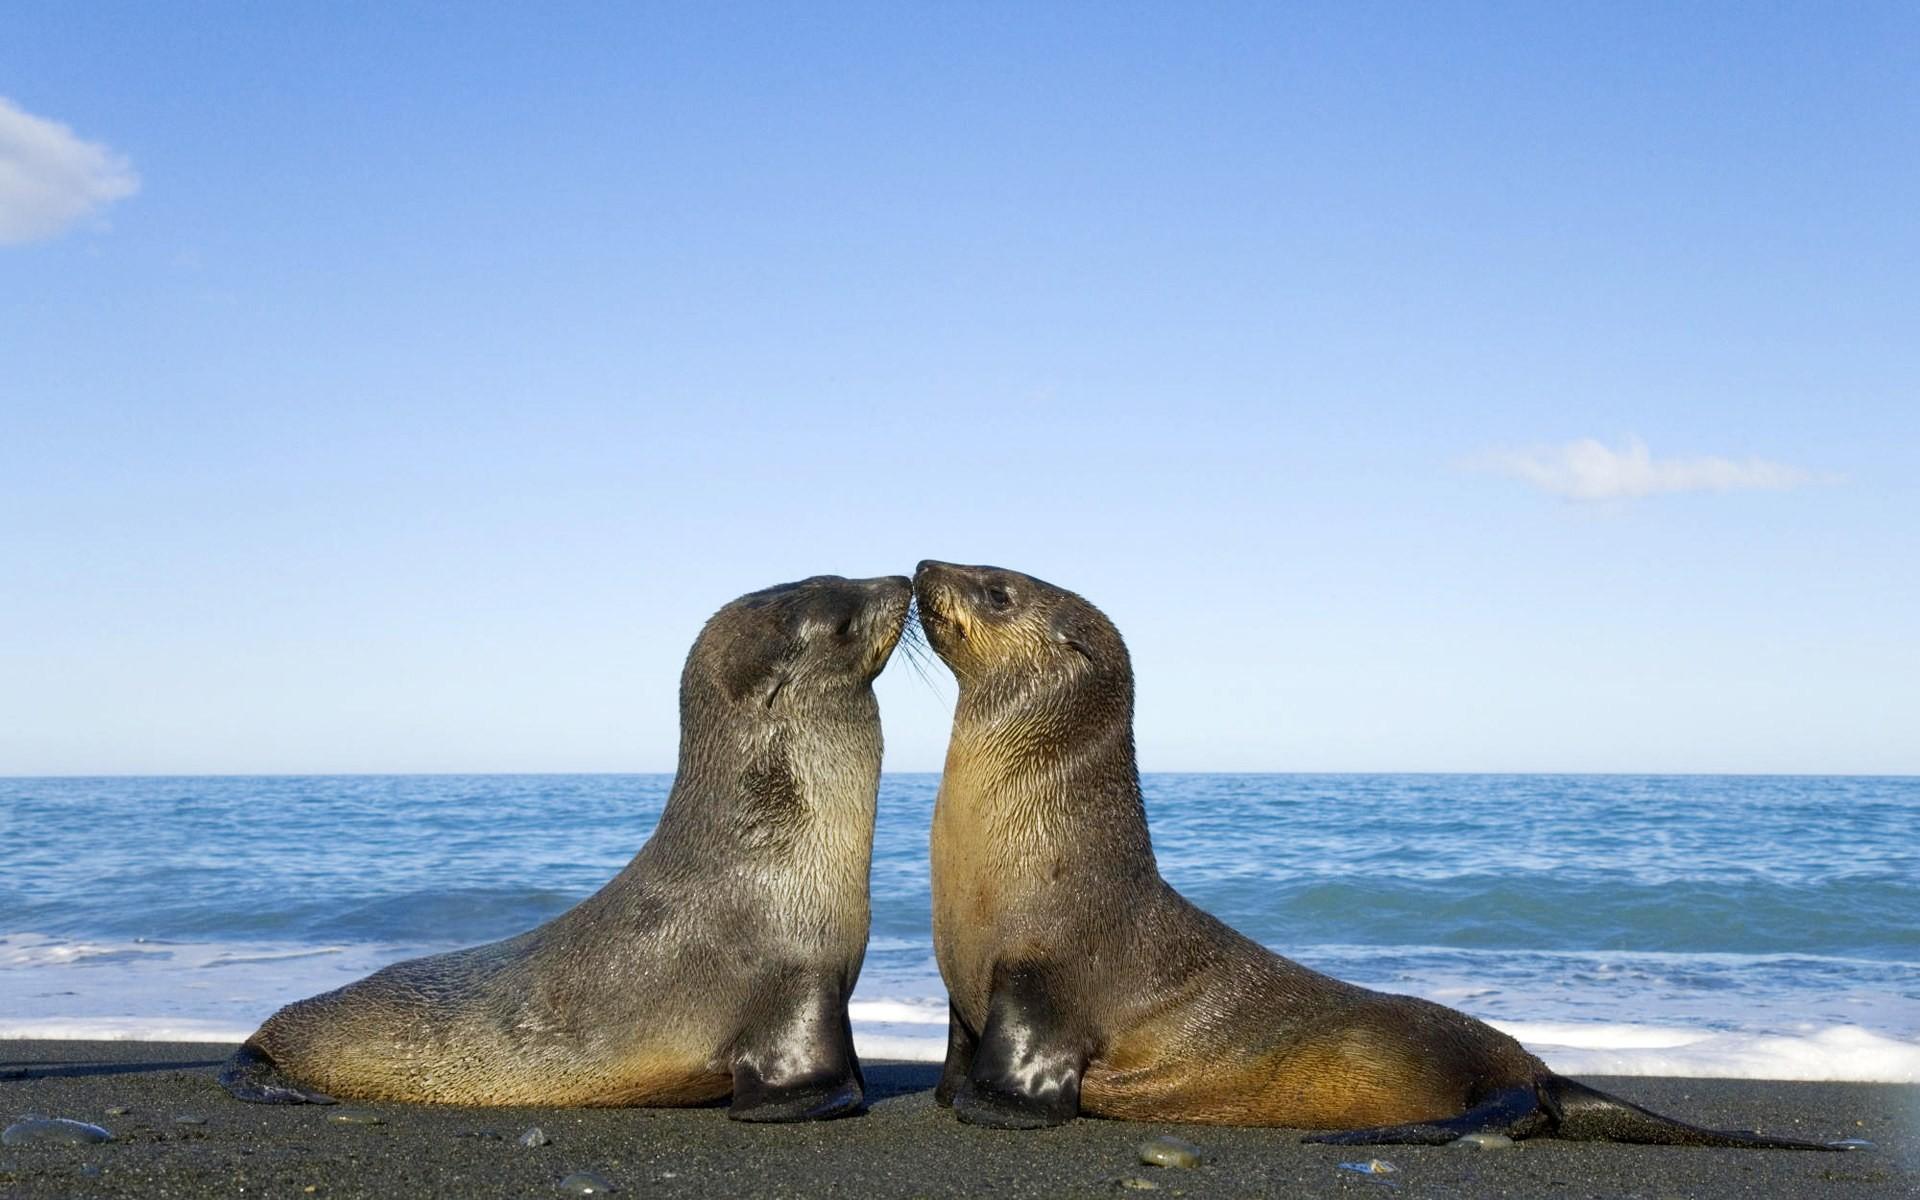 Cute Baby Seals Wallpapers Die 73 Besten S 252 223 E Tierbabys Hintergrundbilder